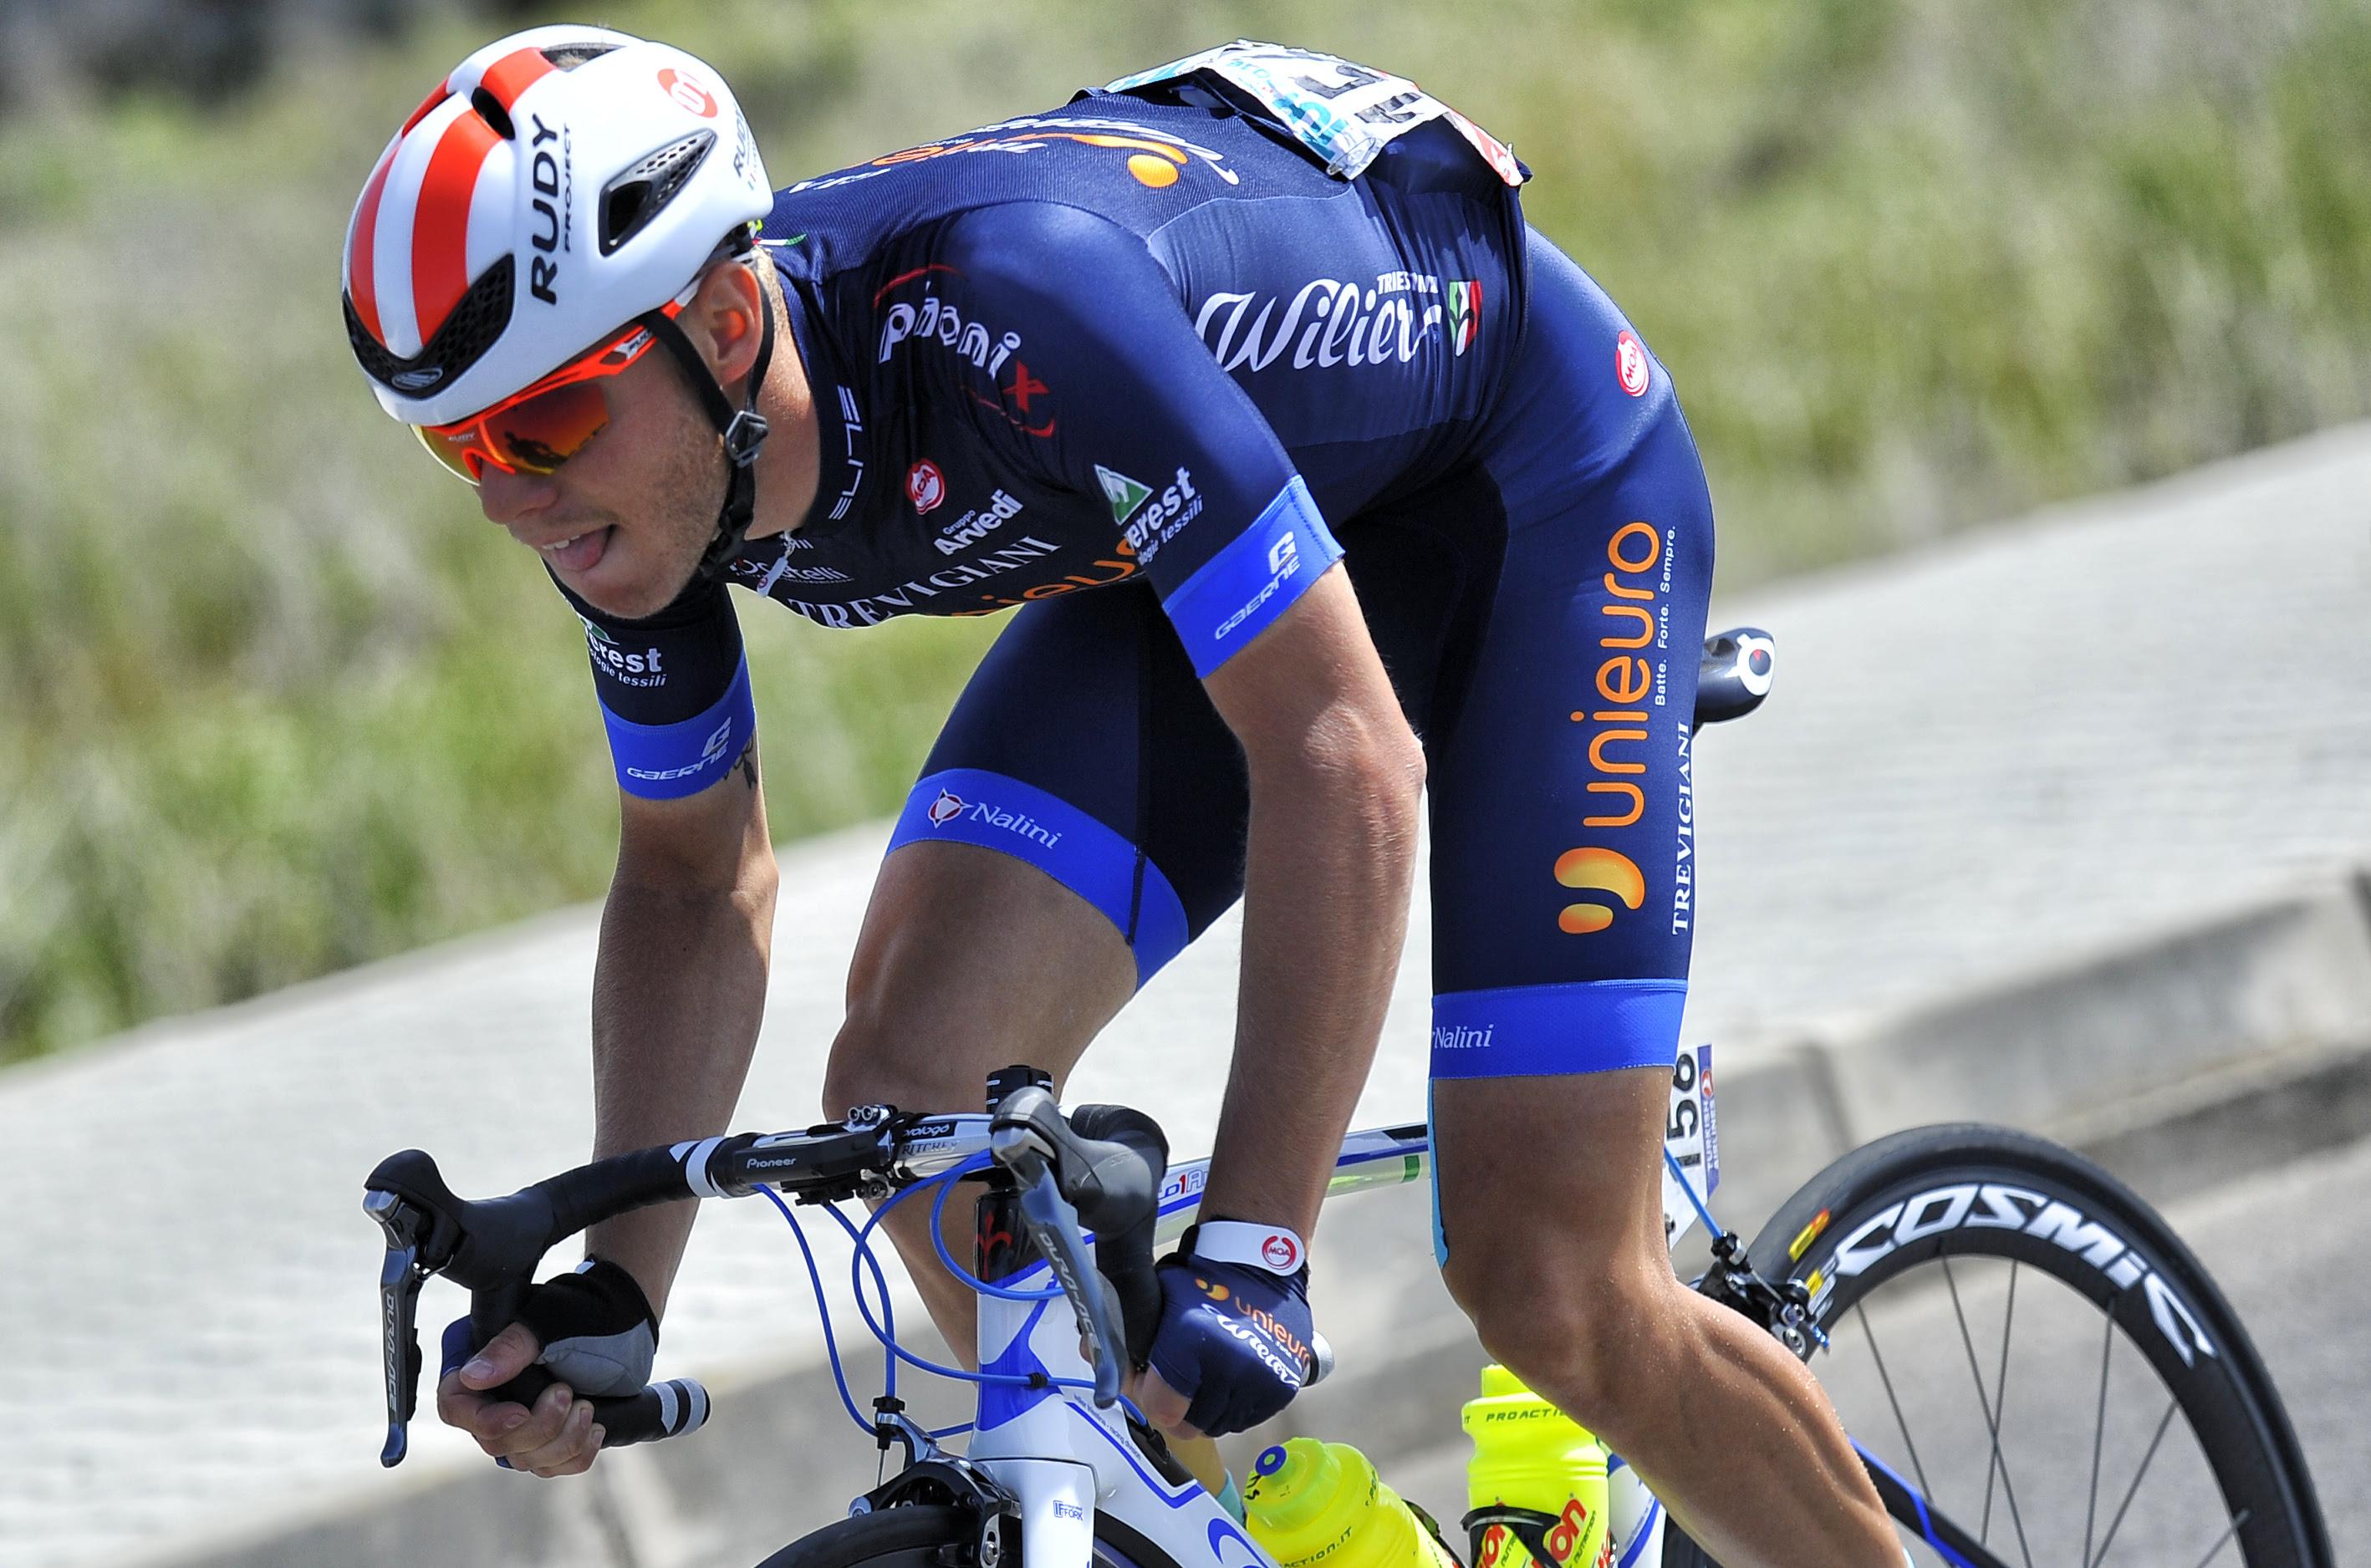 Enrico Salvador